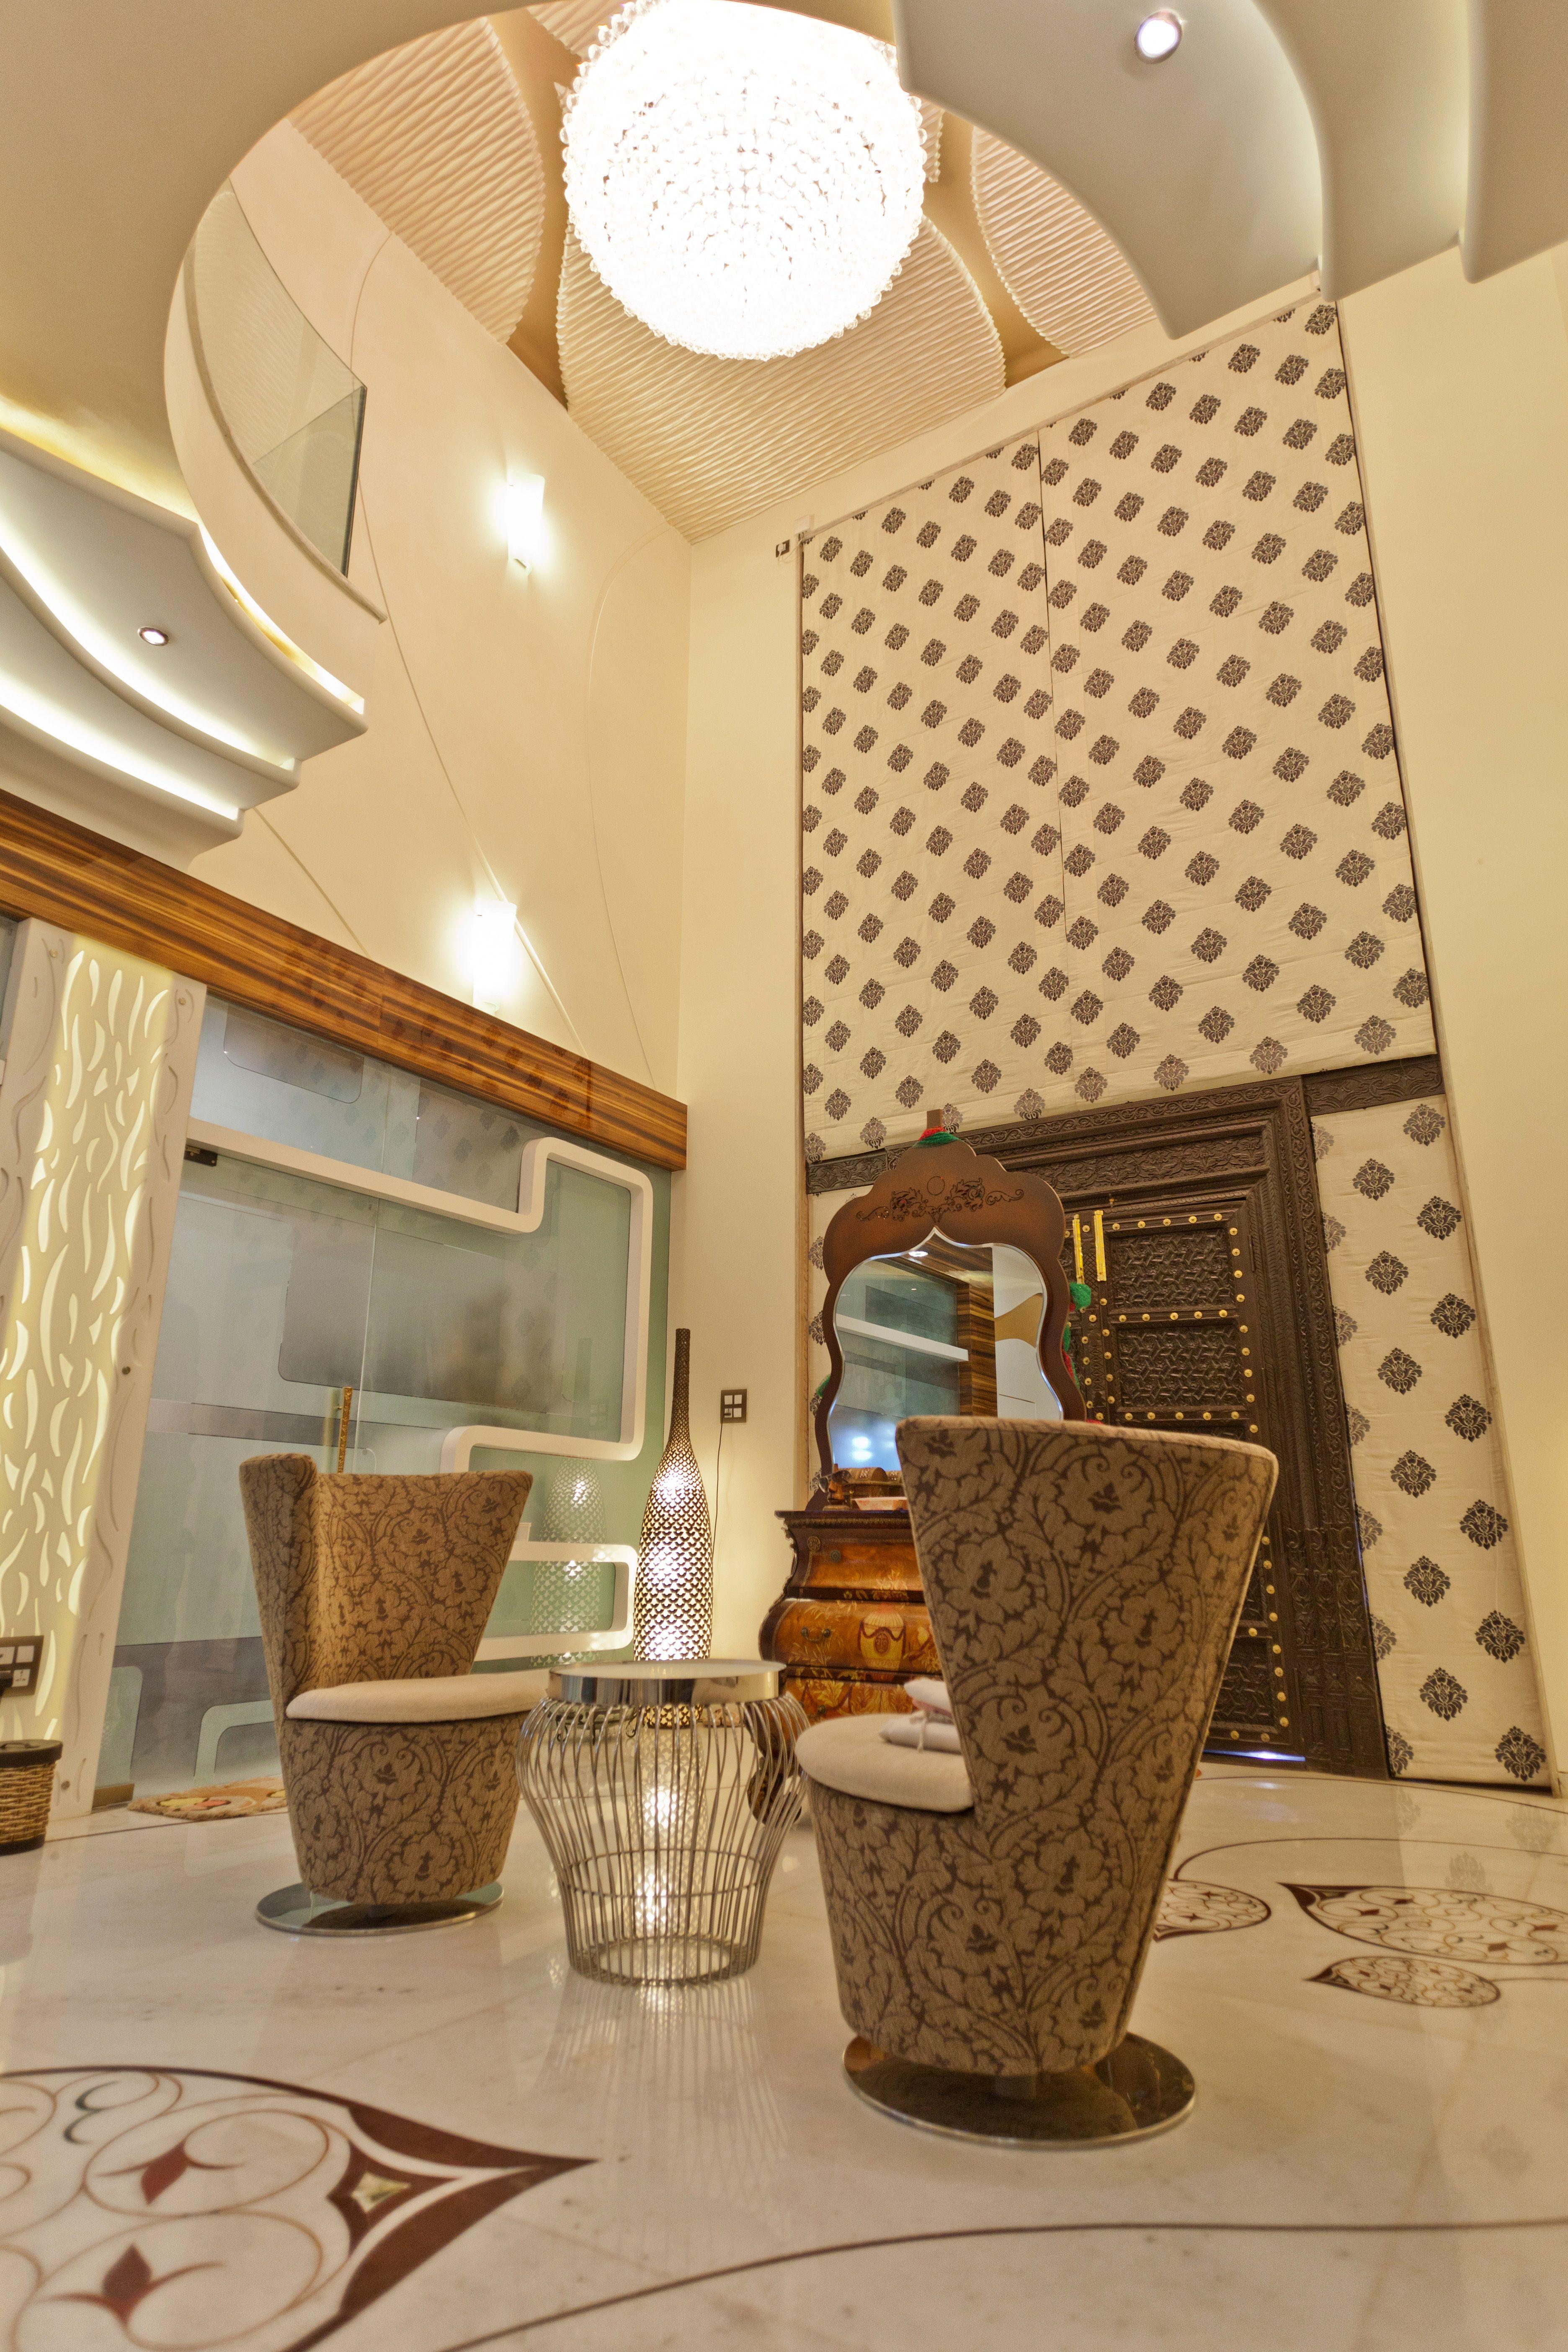 Wall Decor For Living Room India Fan Ideas Double Height Entrance Lobby | ...